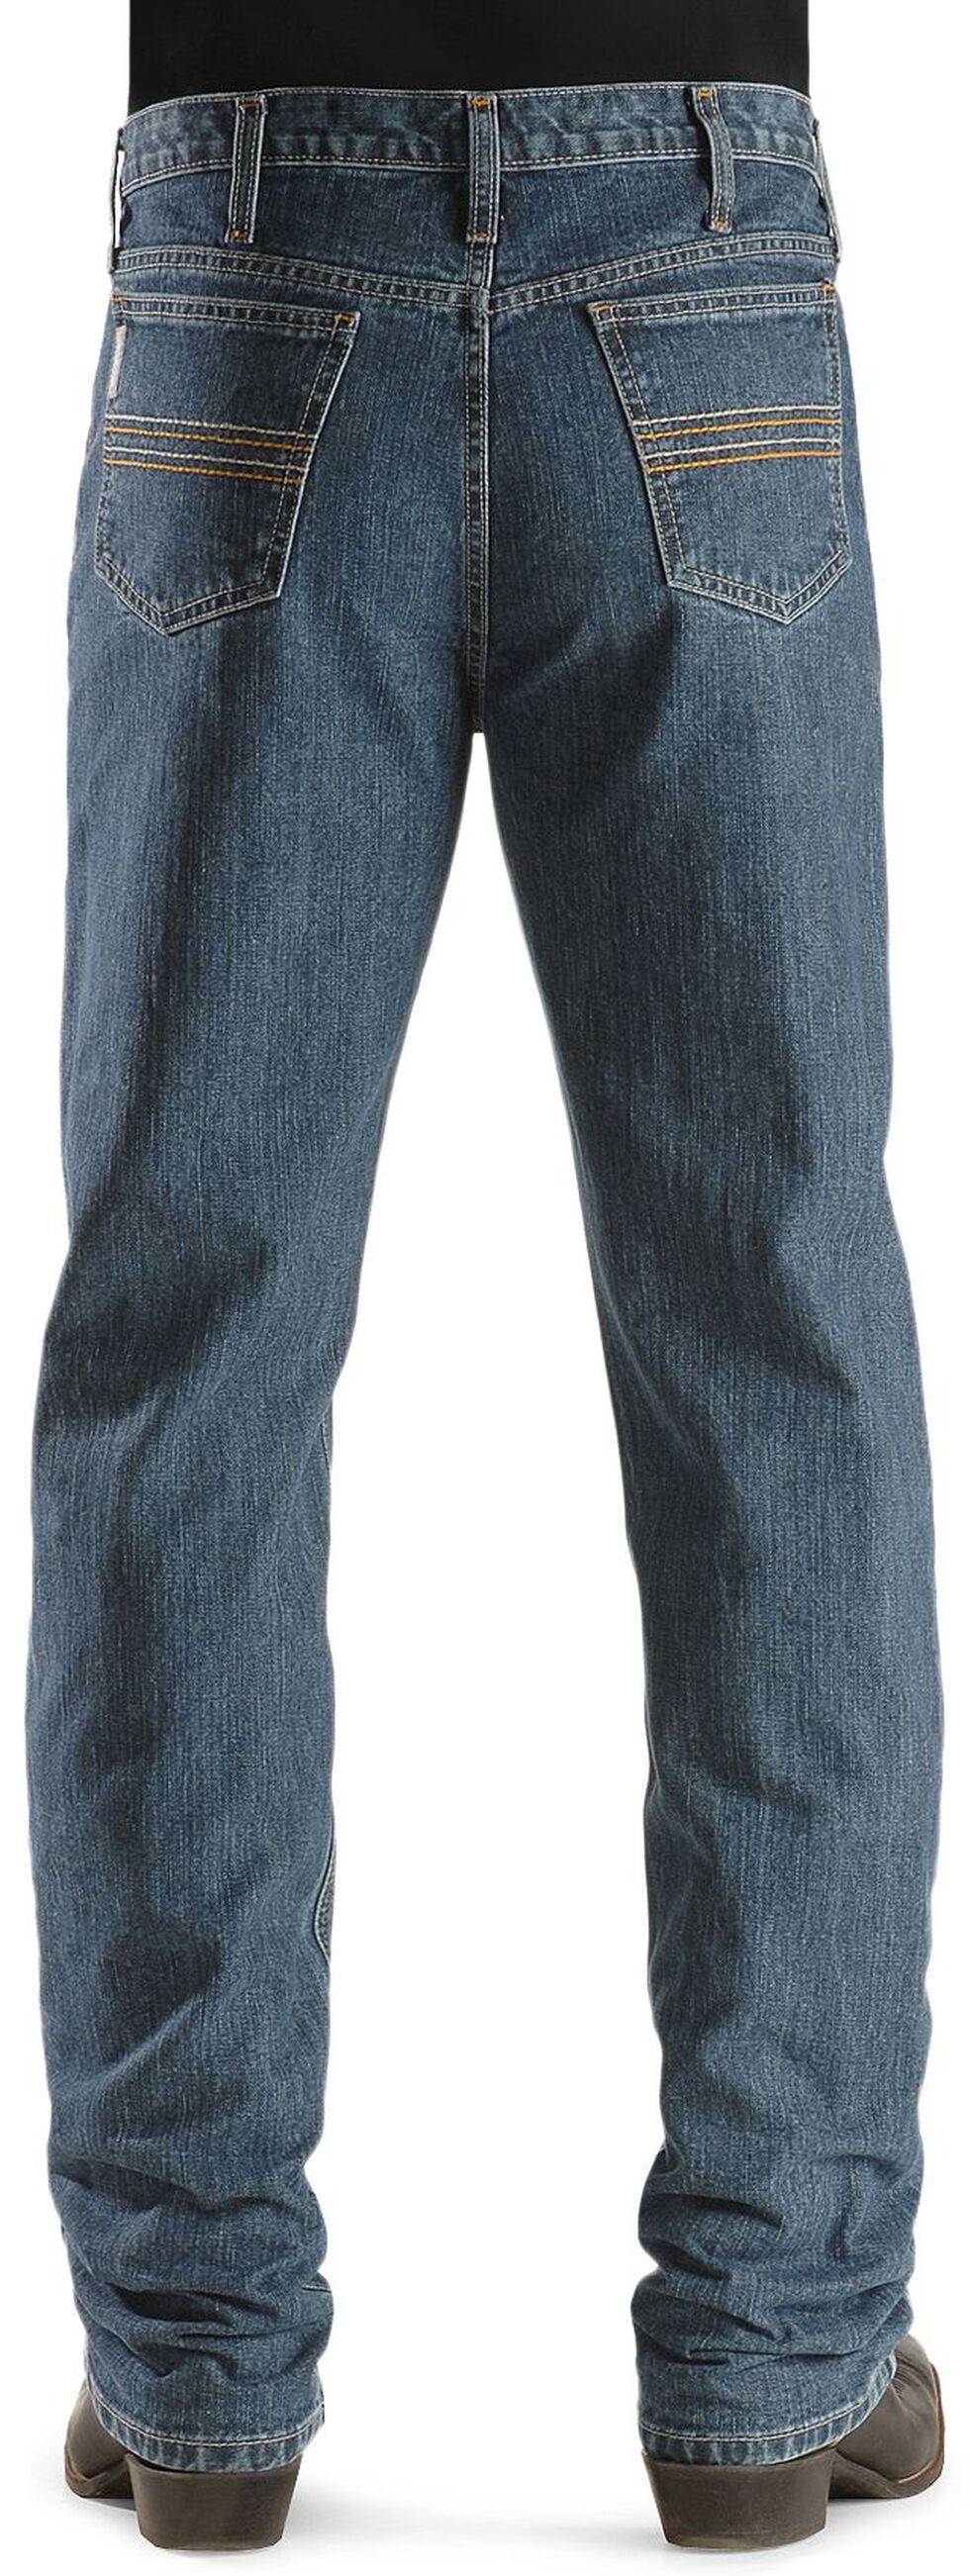 Cinch Silver Label Straight Leg Jeans, Indigo, hi-res